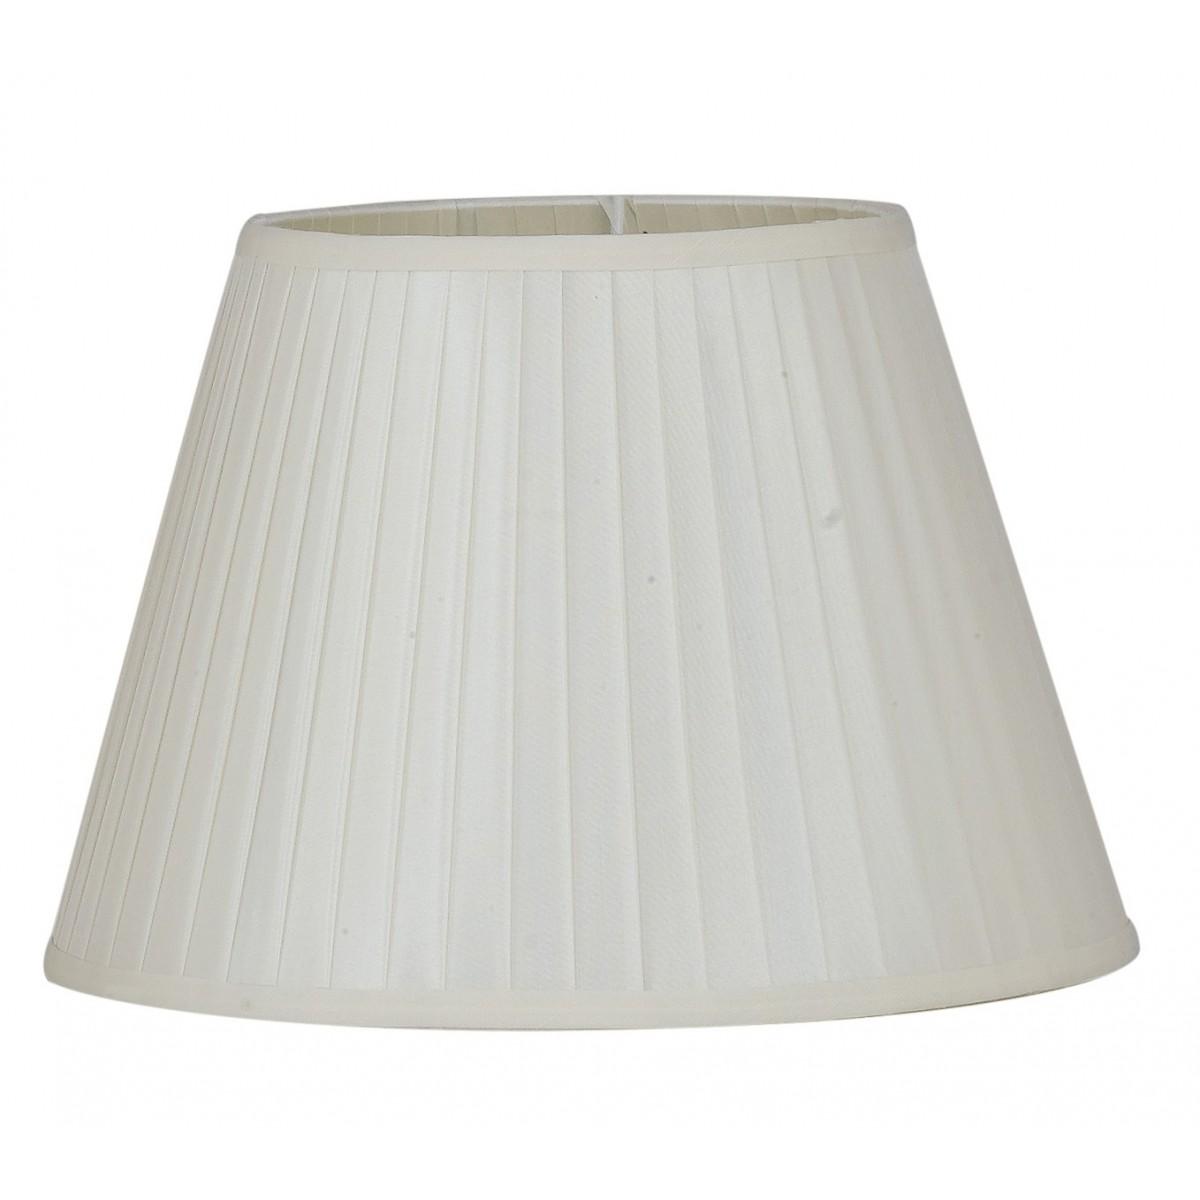 I-PRLM-ORTENSIA-L - Abat-jour Ortensia White Fabric 28x20 cm